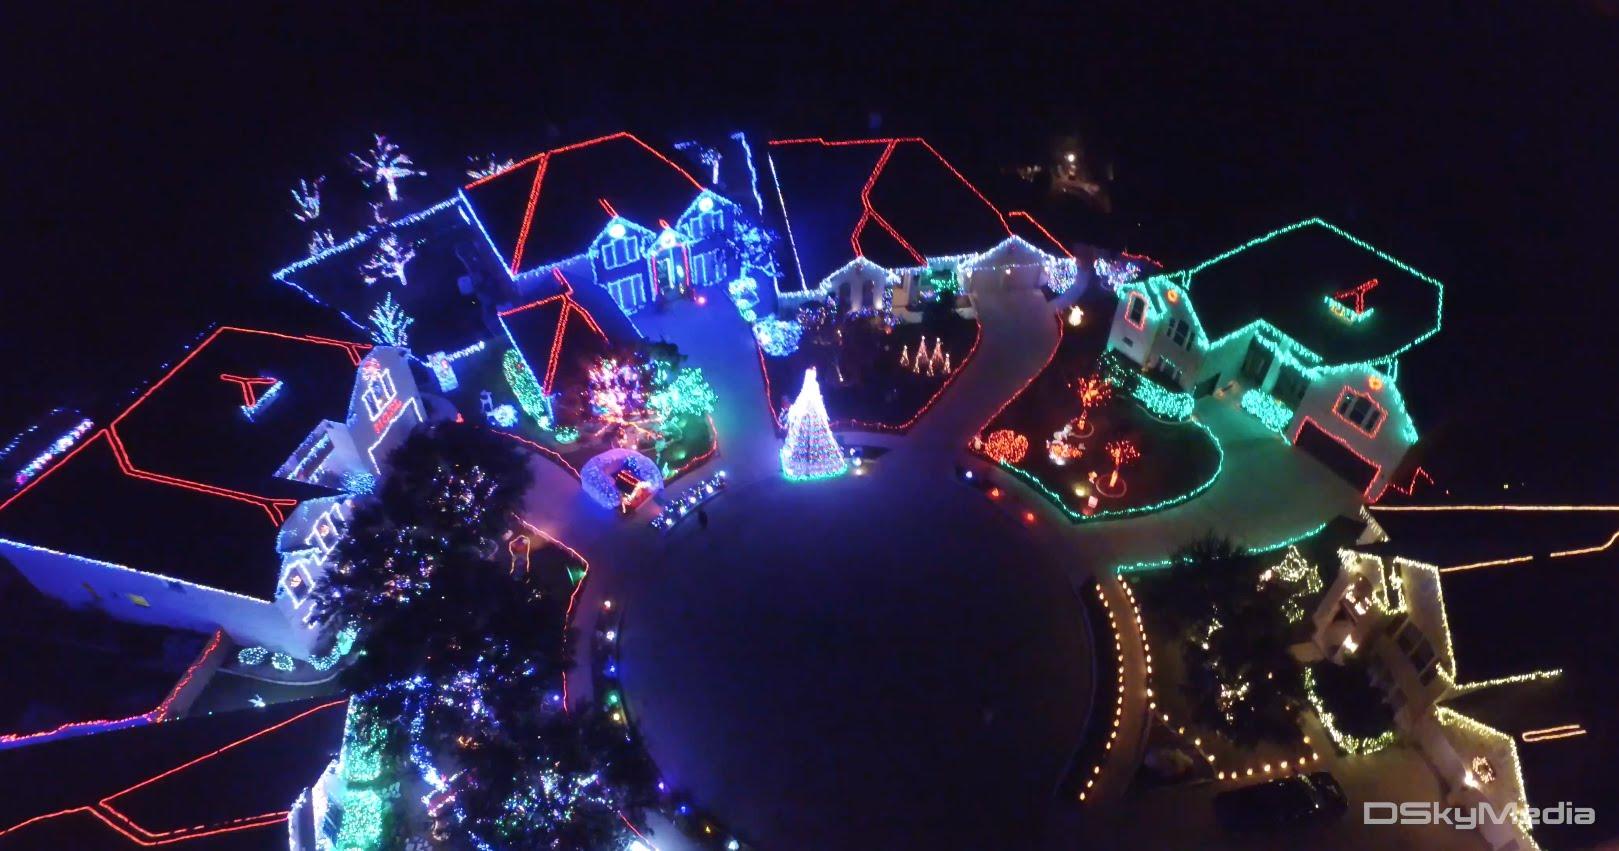 Christmas Lights Drone Video 4k Aerial Footage Best